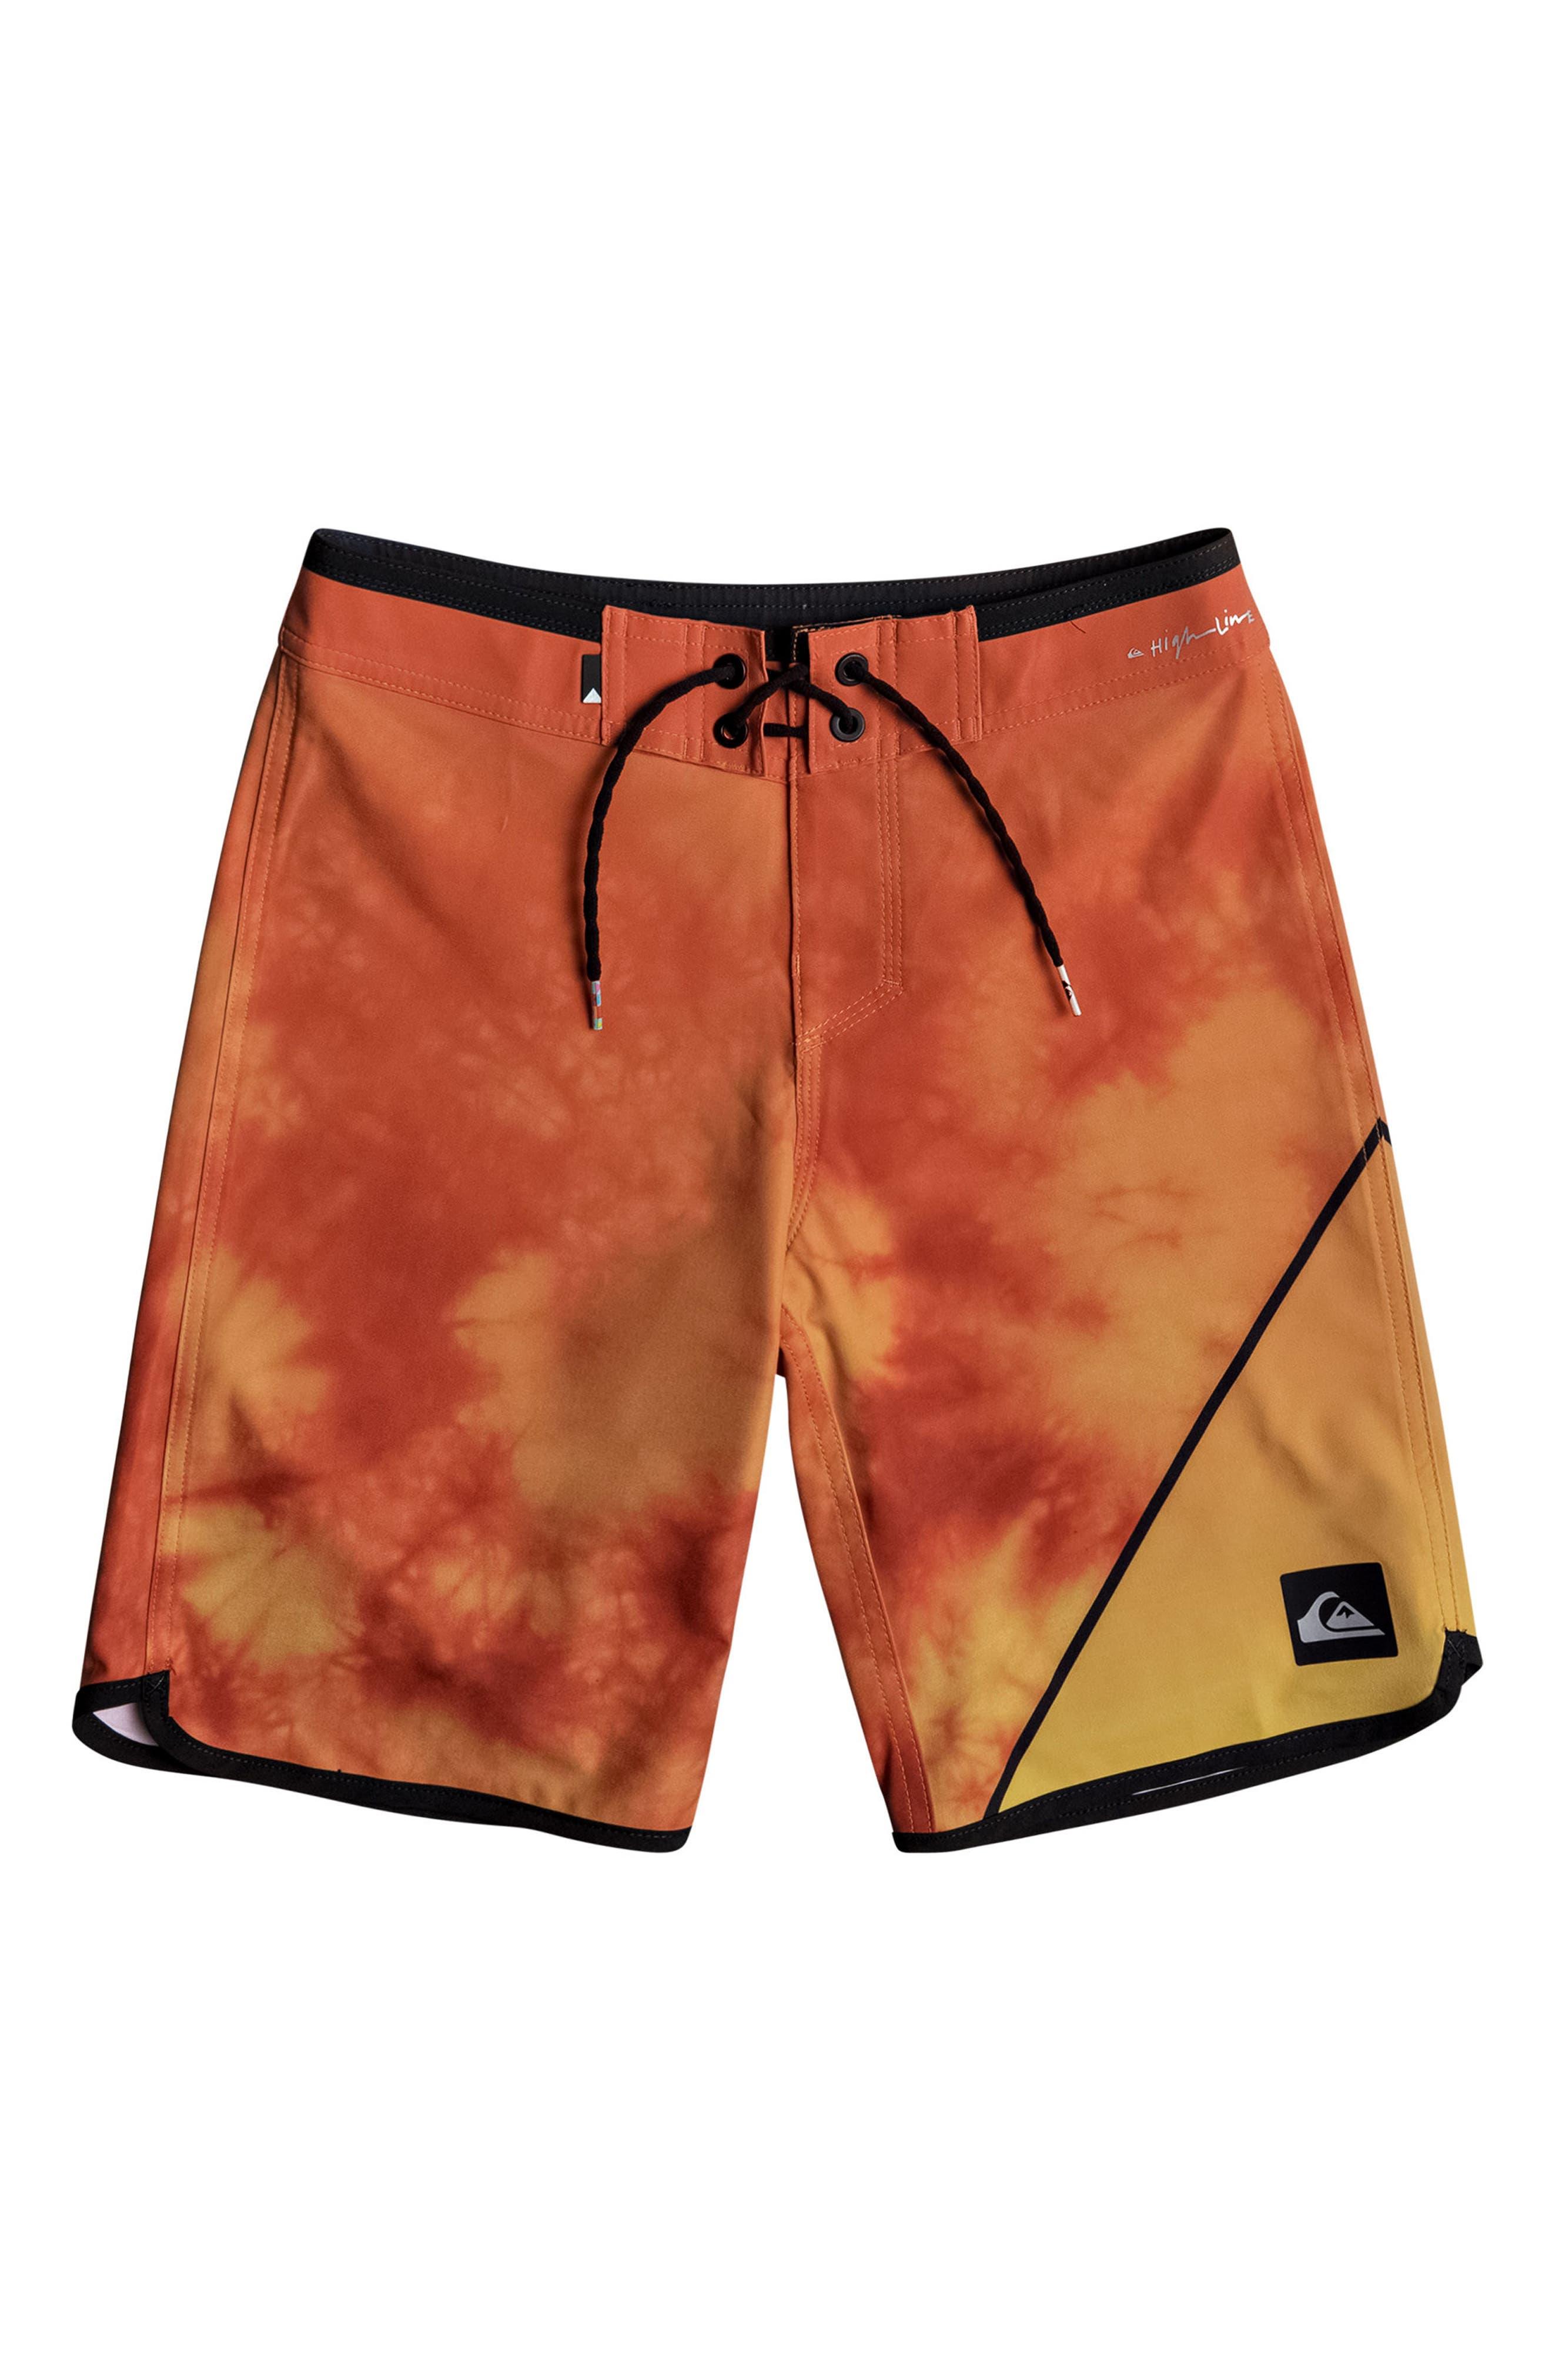 New Wave Board Shorts,                         Main,                         color, Cherry Tomato